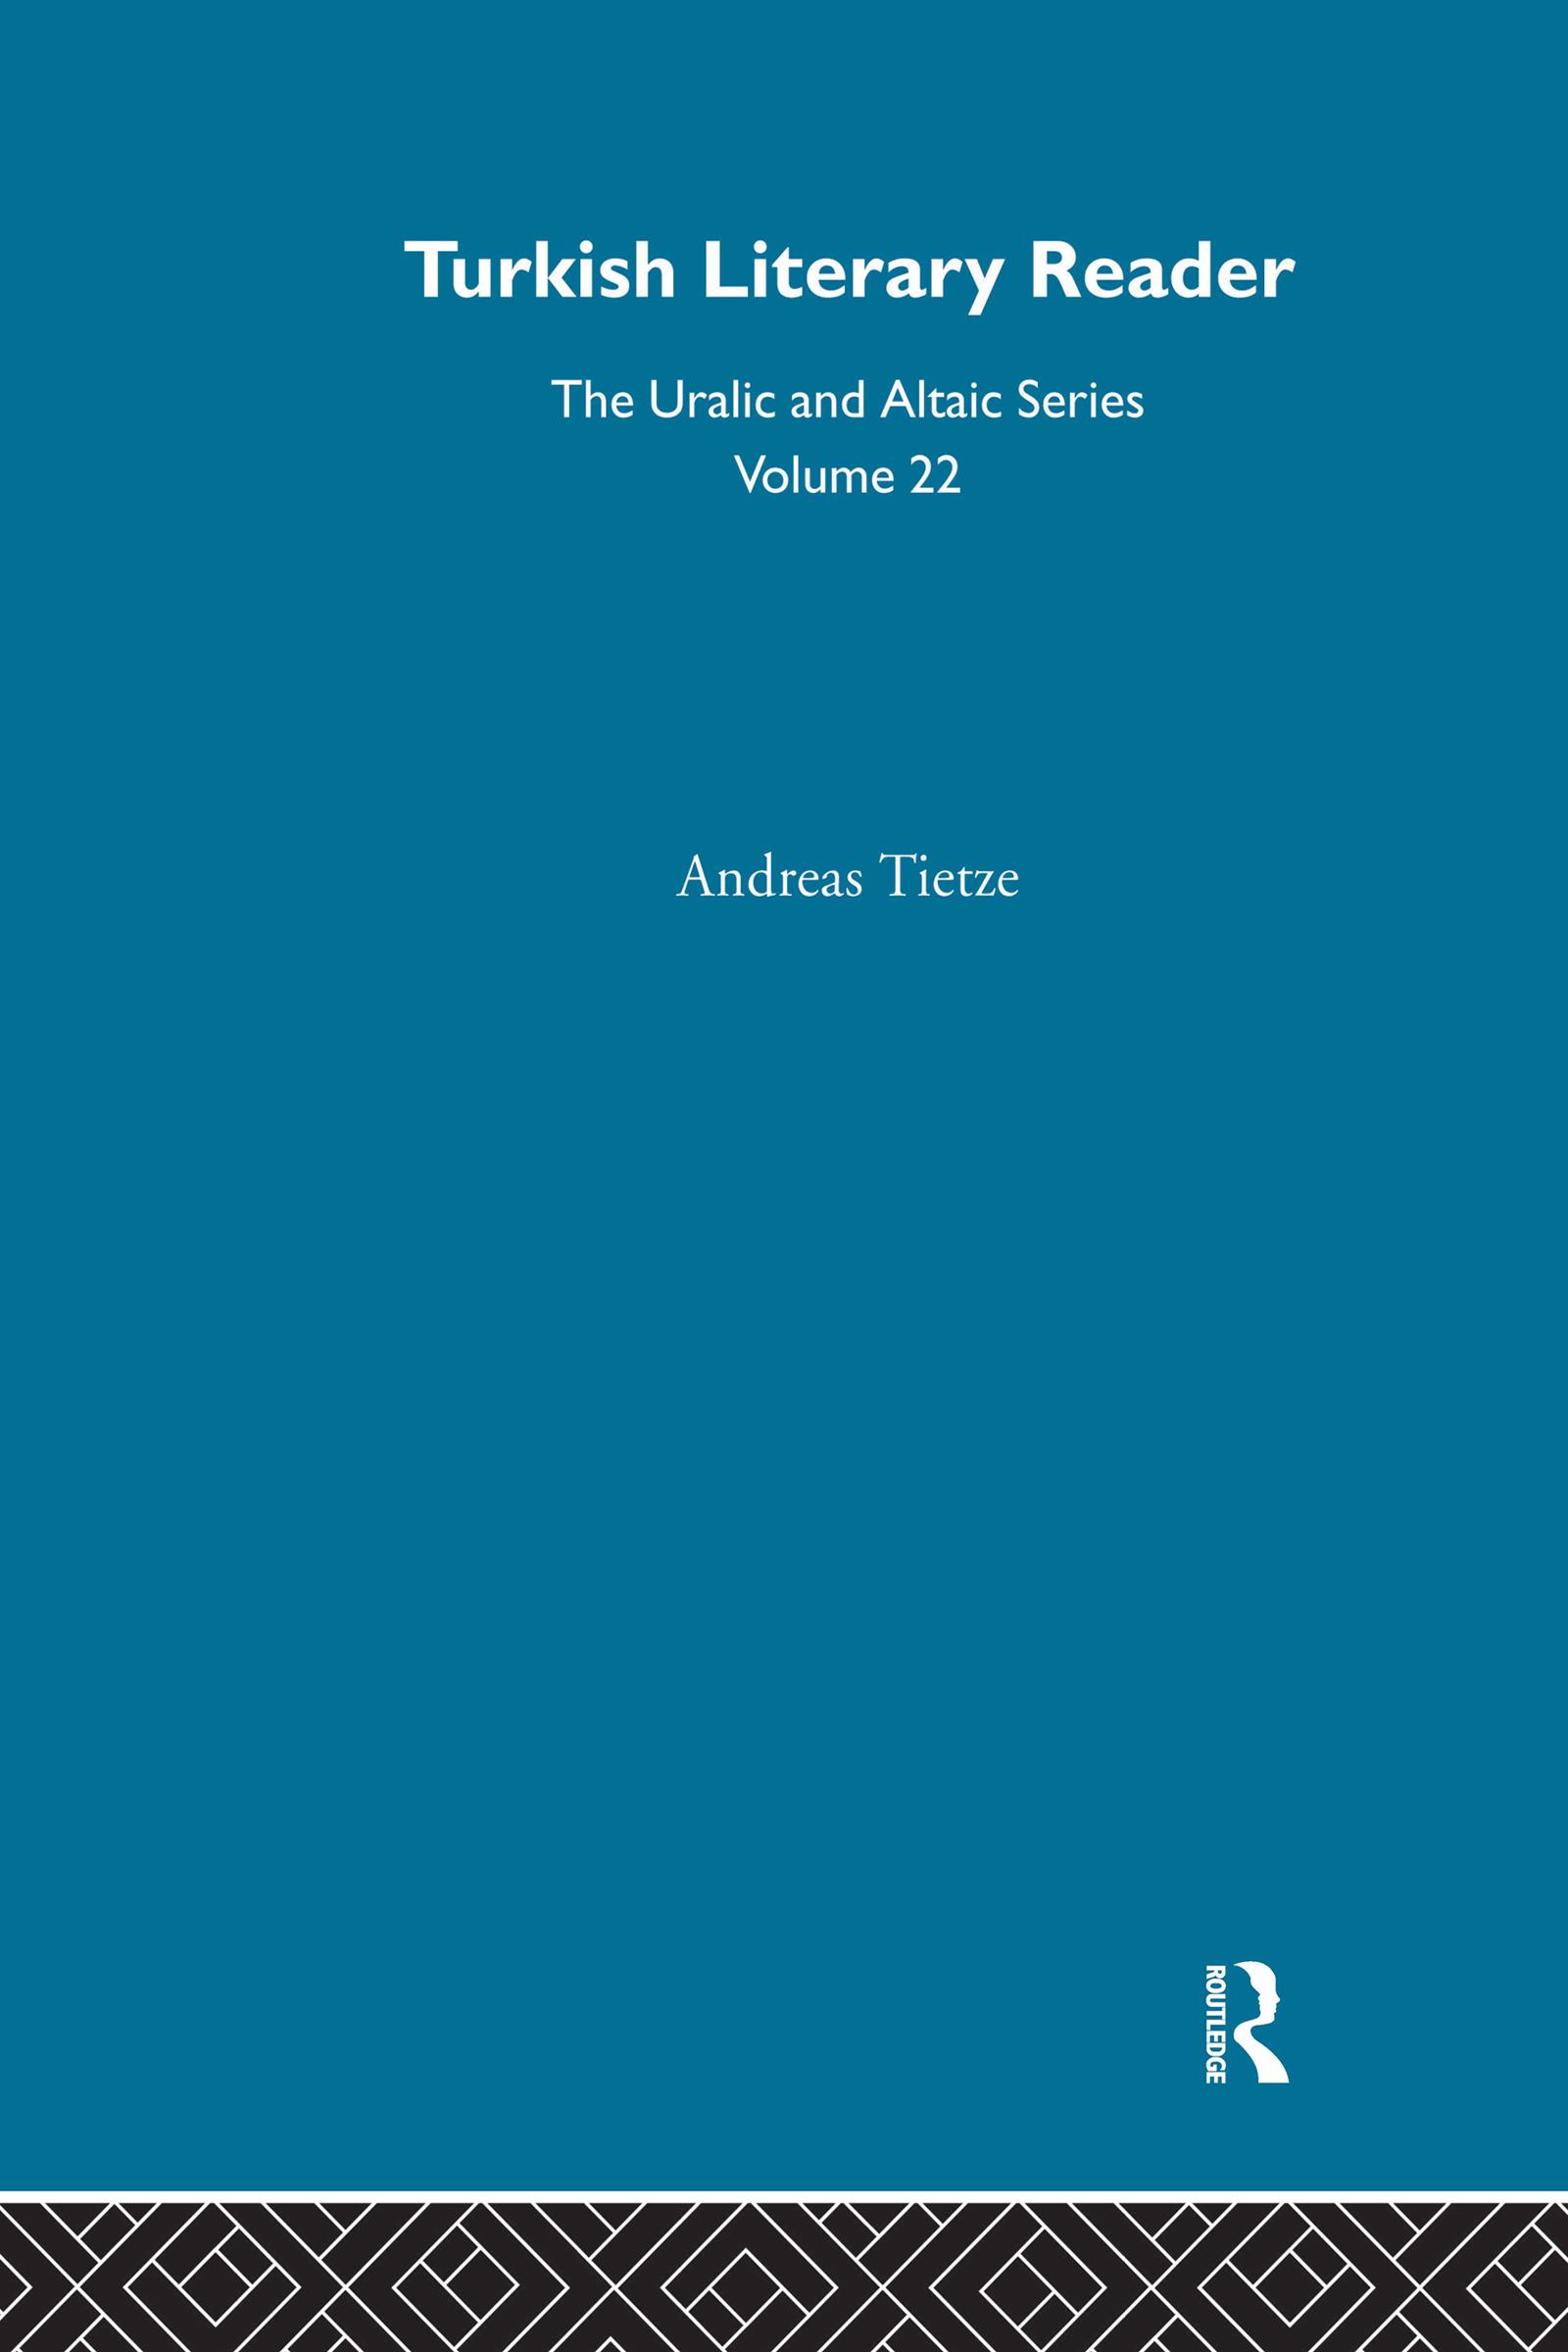 Turkish Literary Reader